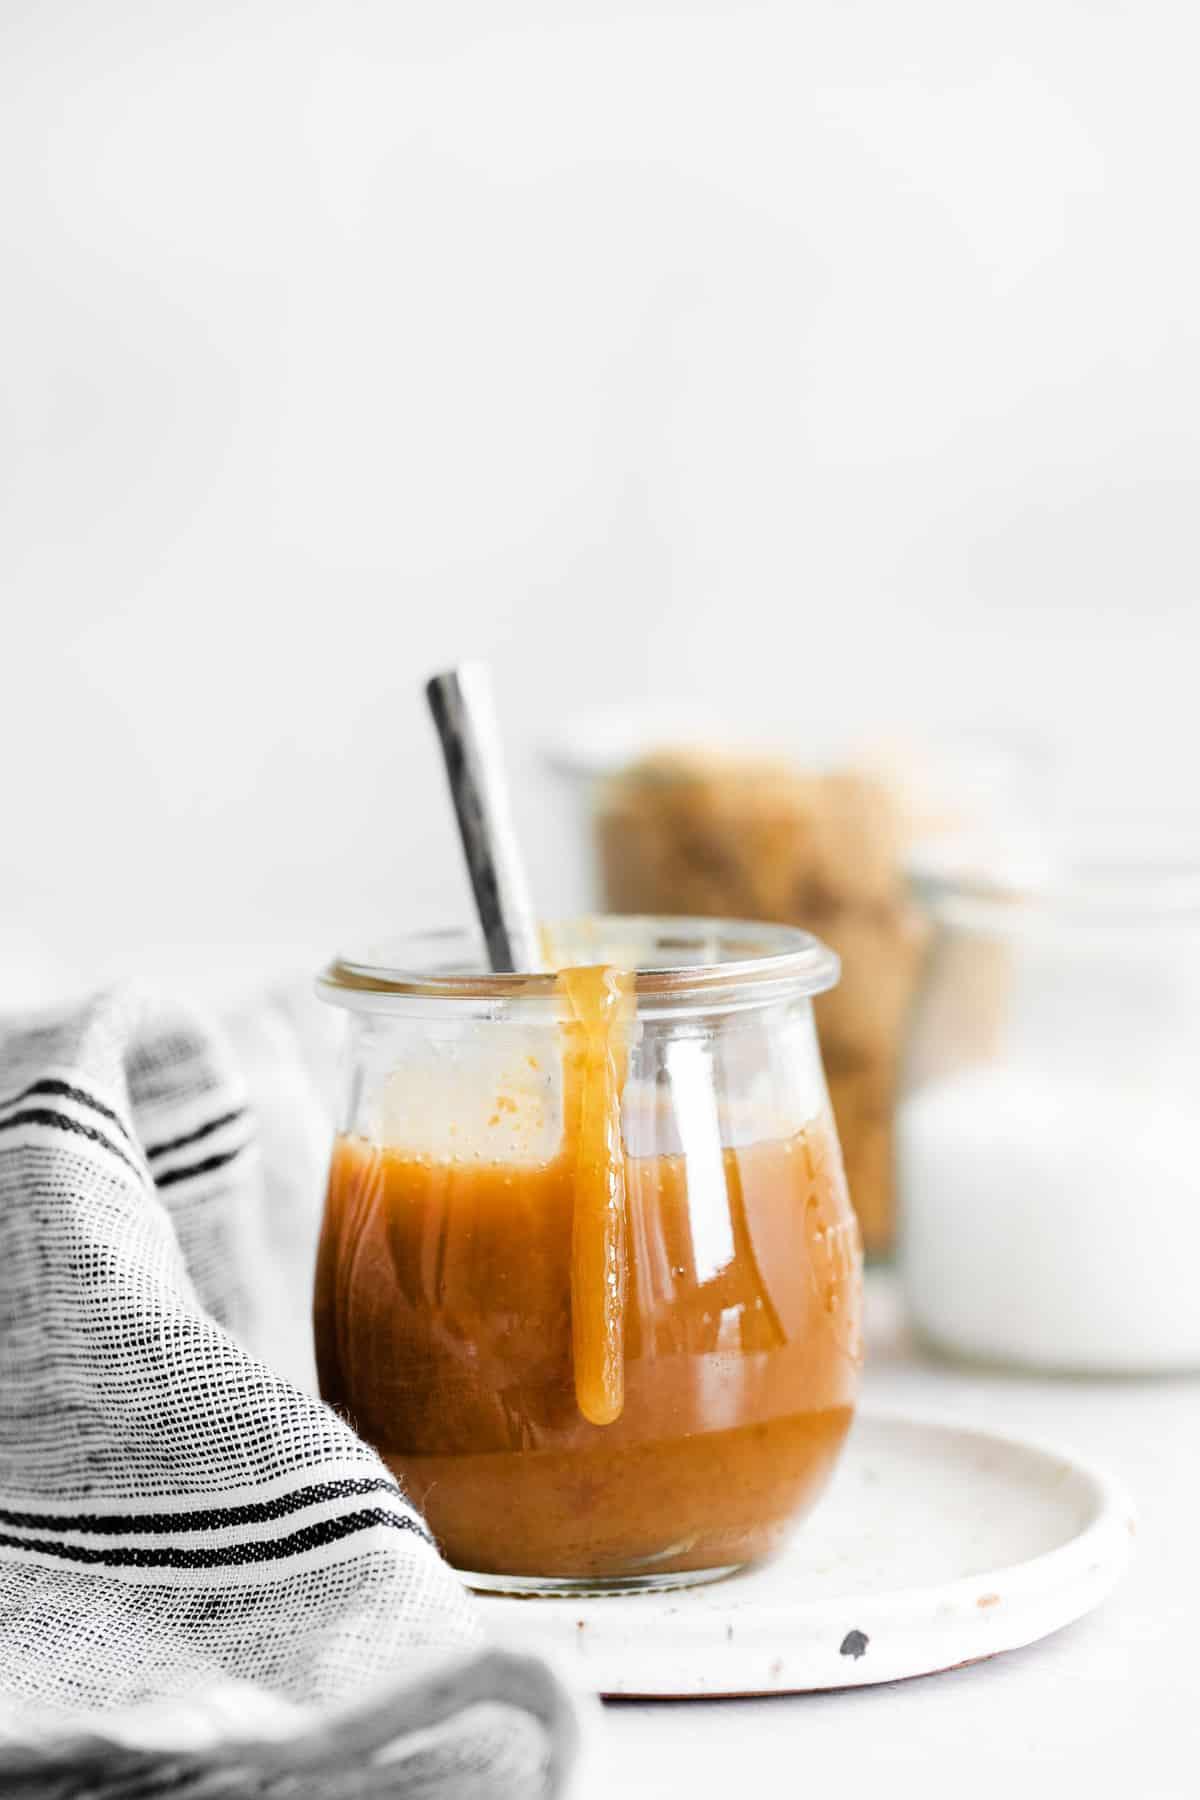 Jar of vegan caramel with sauce dripping down side of jar.